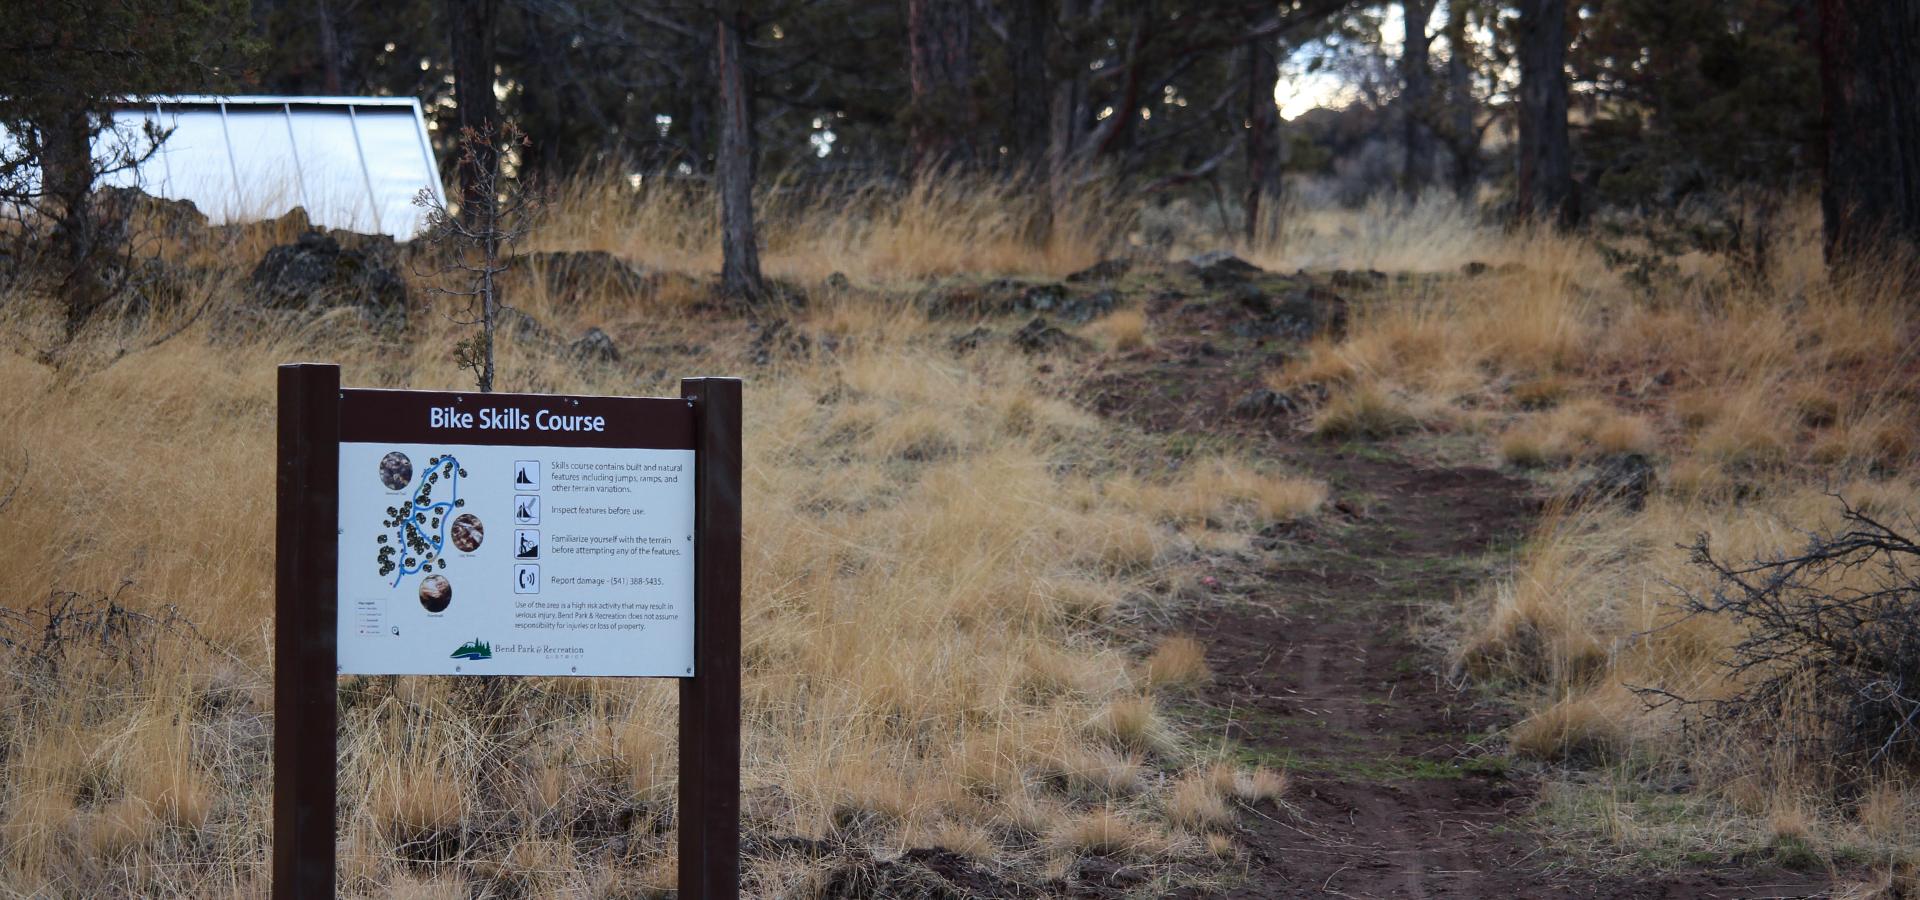 Stone-Creek-Park-Bike-Skills-Course